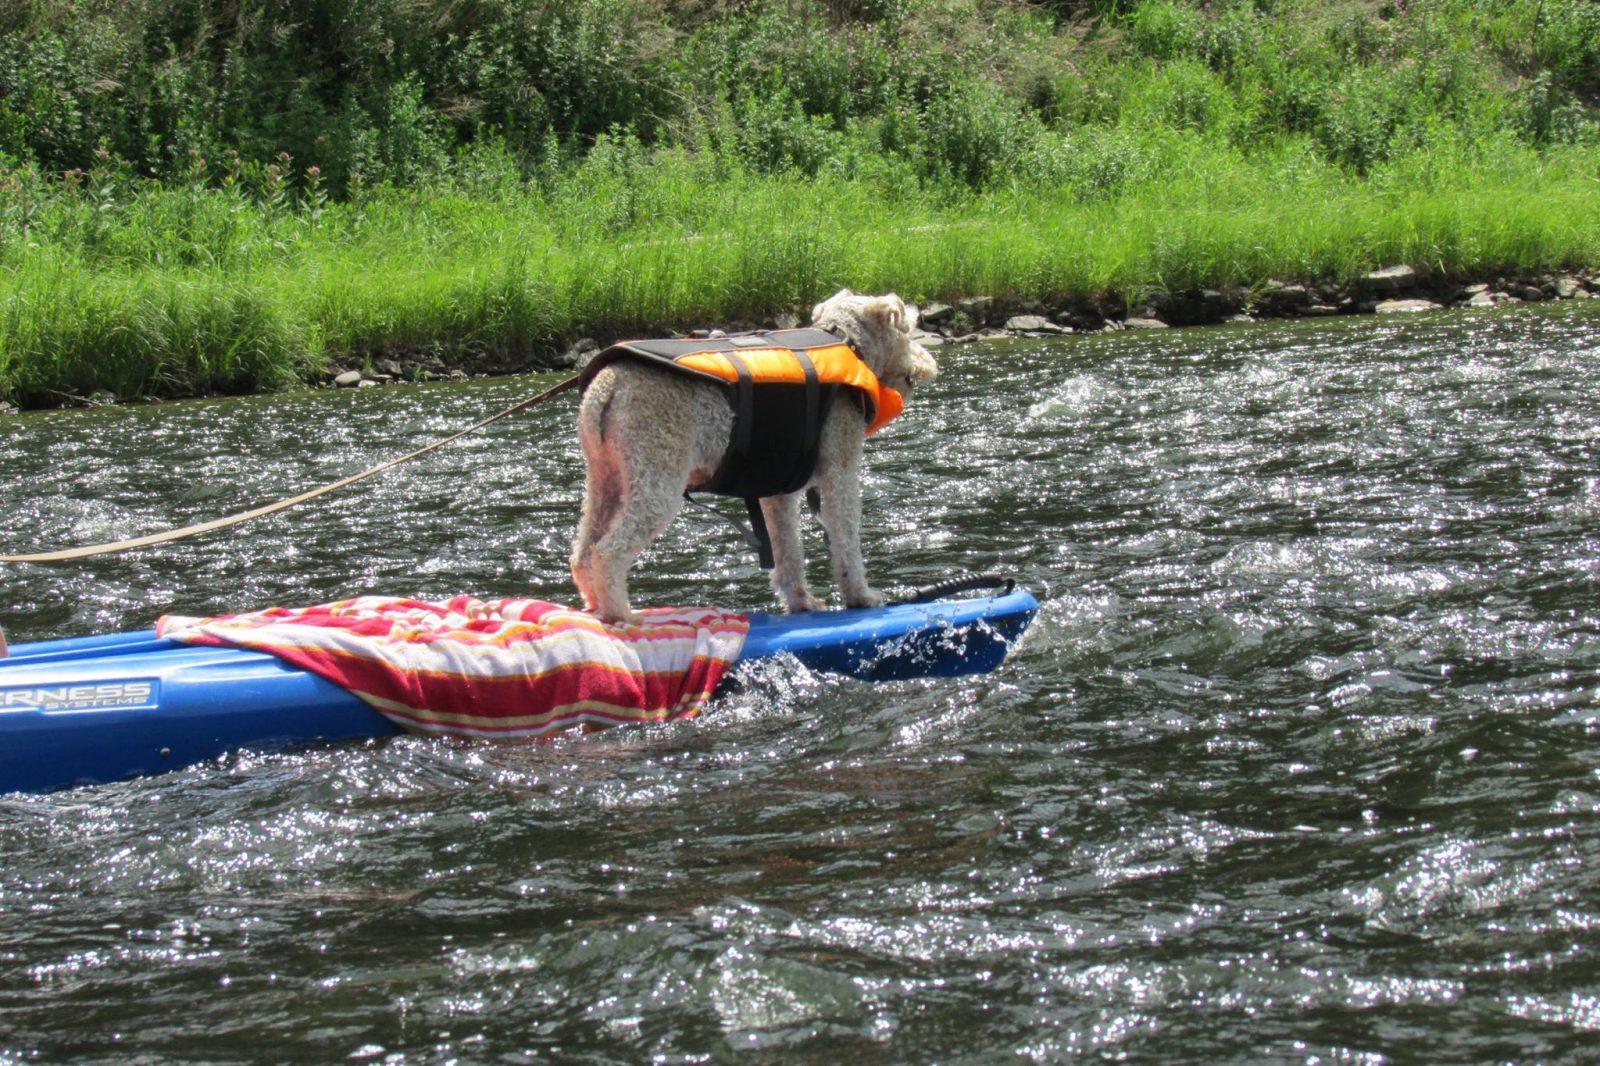 Baleigh Birchurt, USA Kayaking